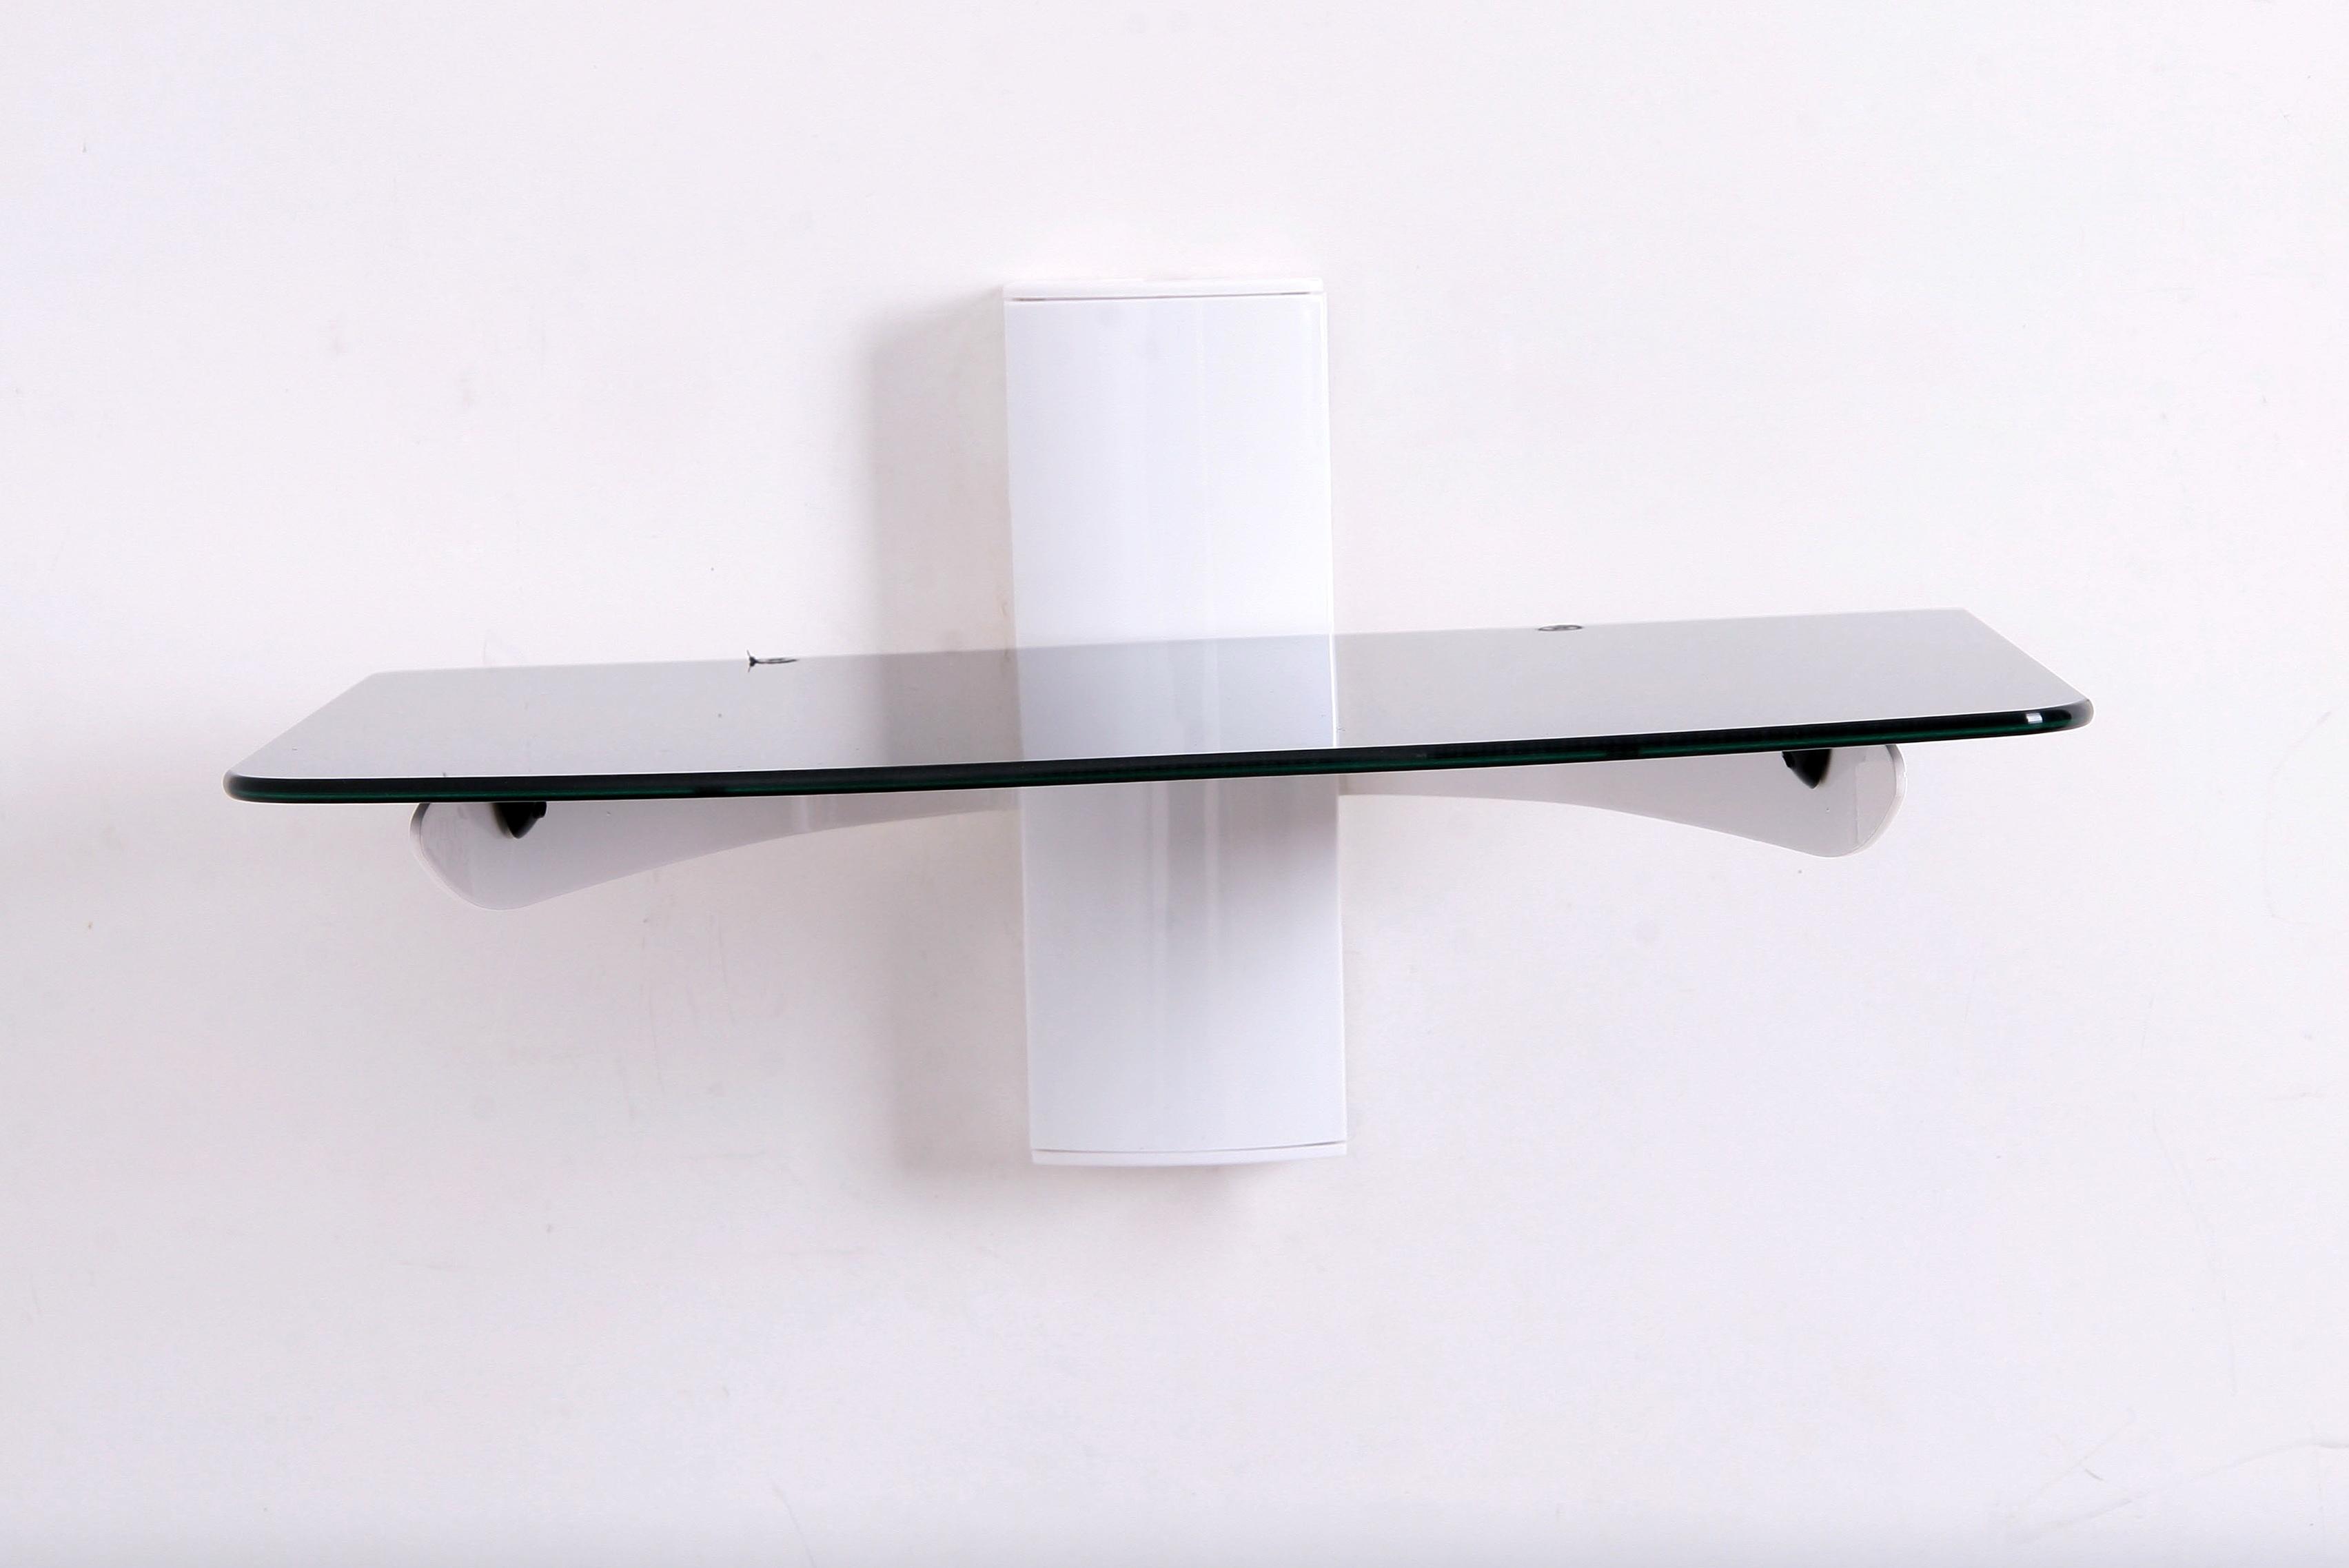 Wall Shelf Ideas For Dvd Player